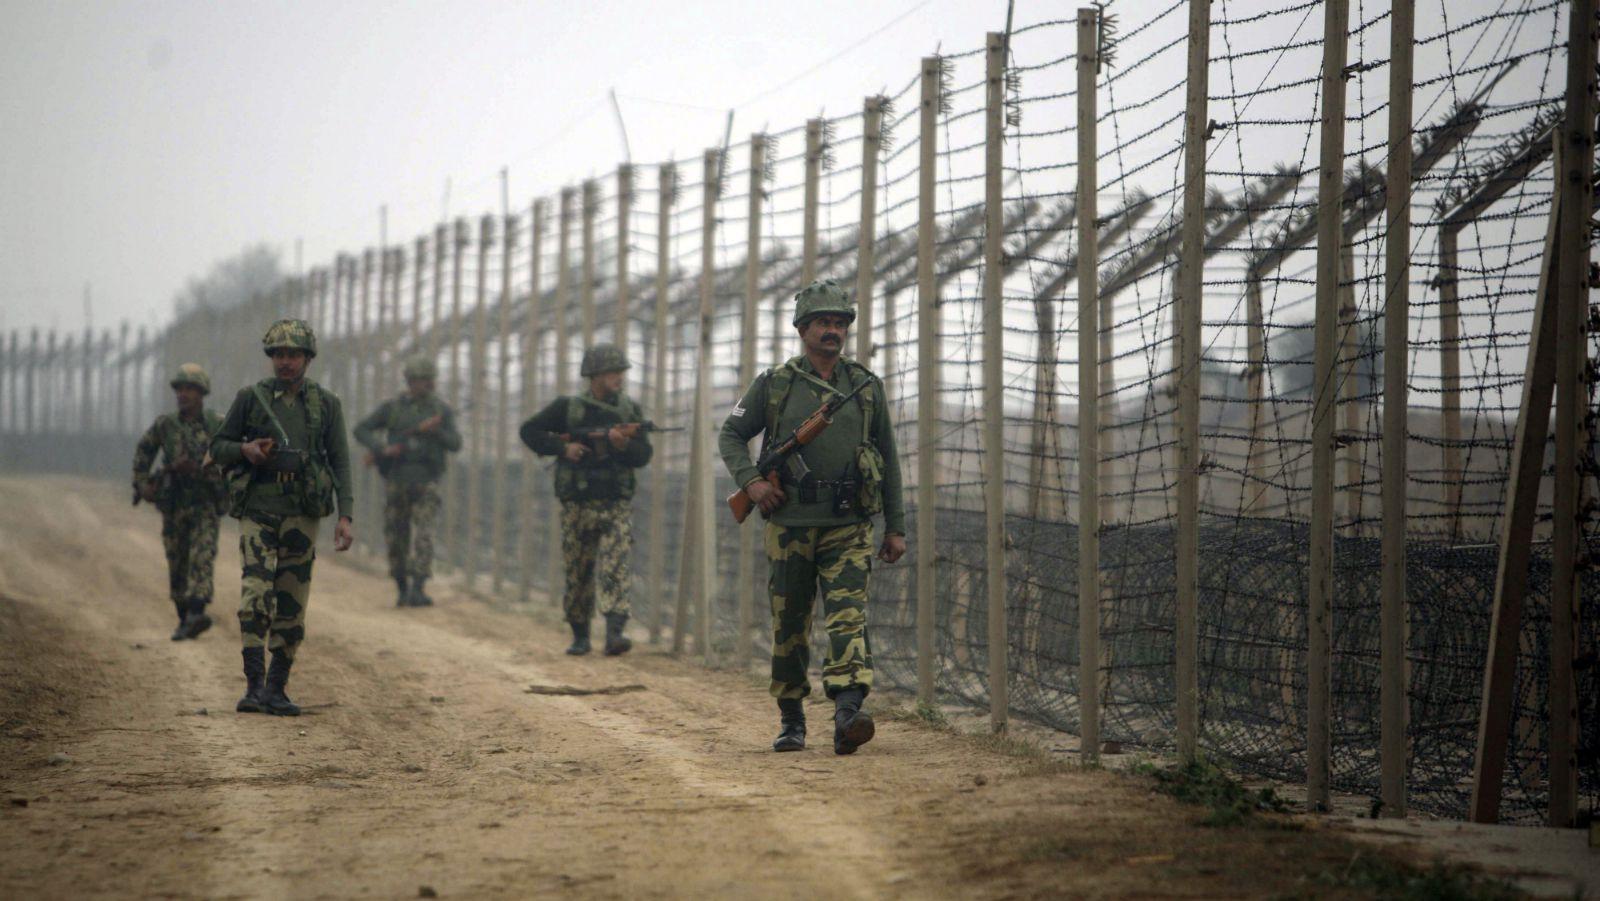 India-Pakistan-Prisoner-Fence